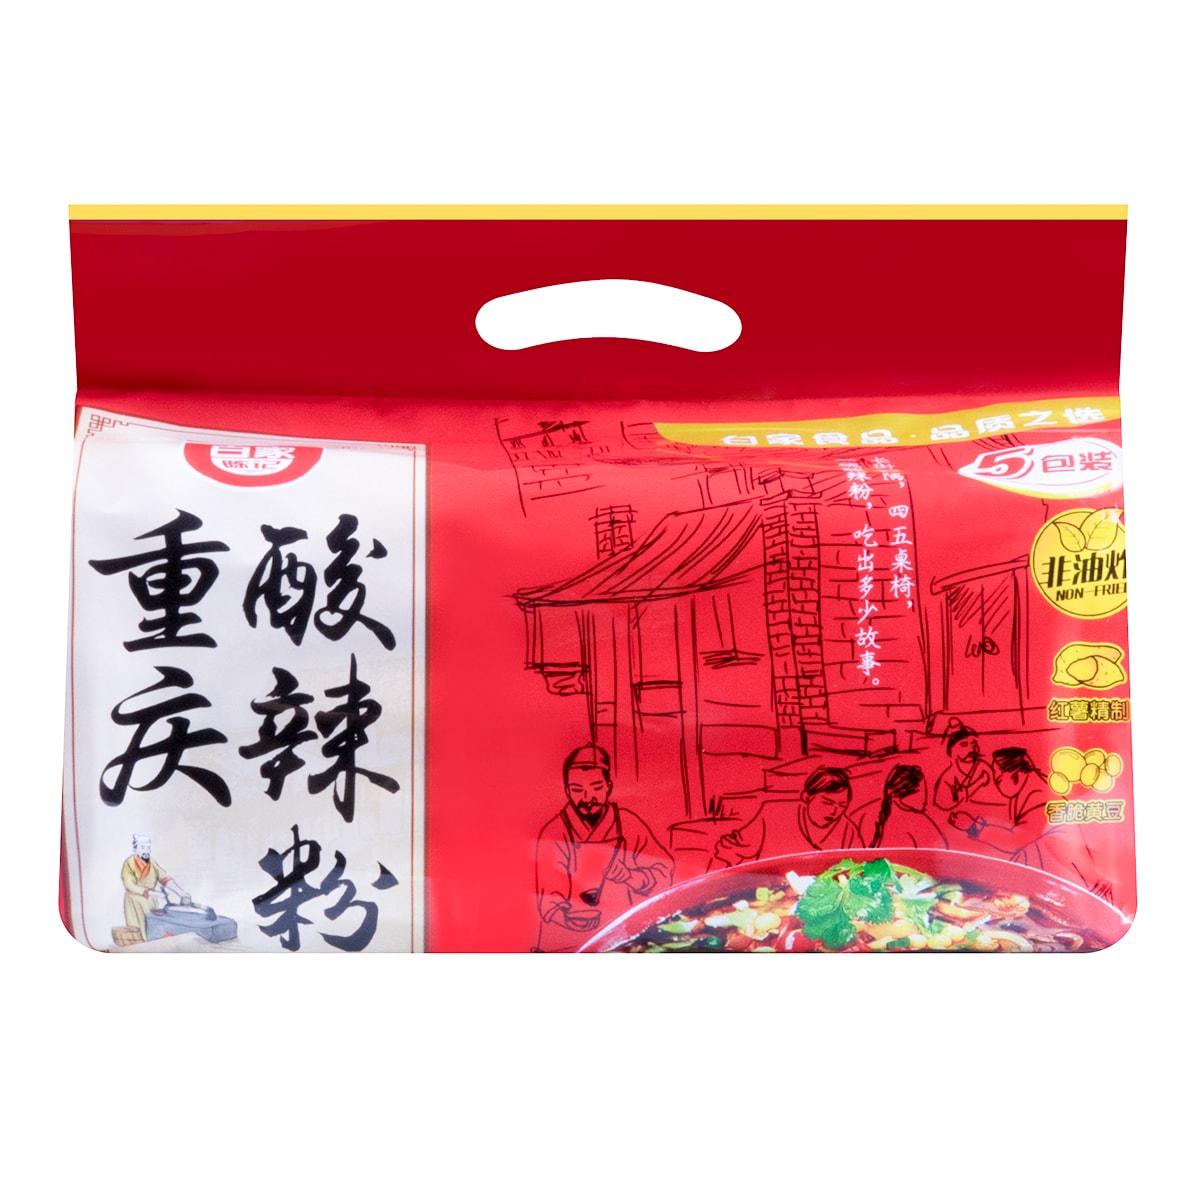 BAIJIA Sour Spicy Instant Noodle 425g